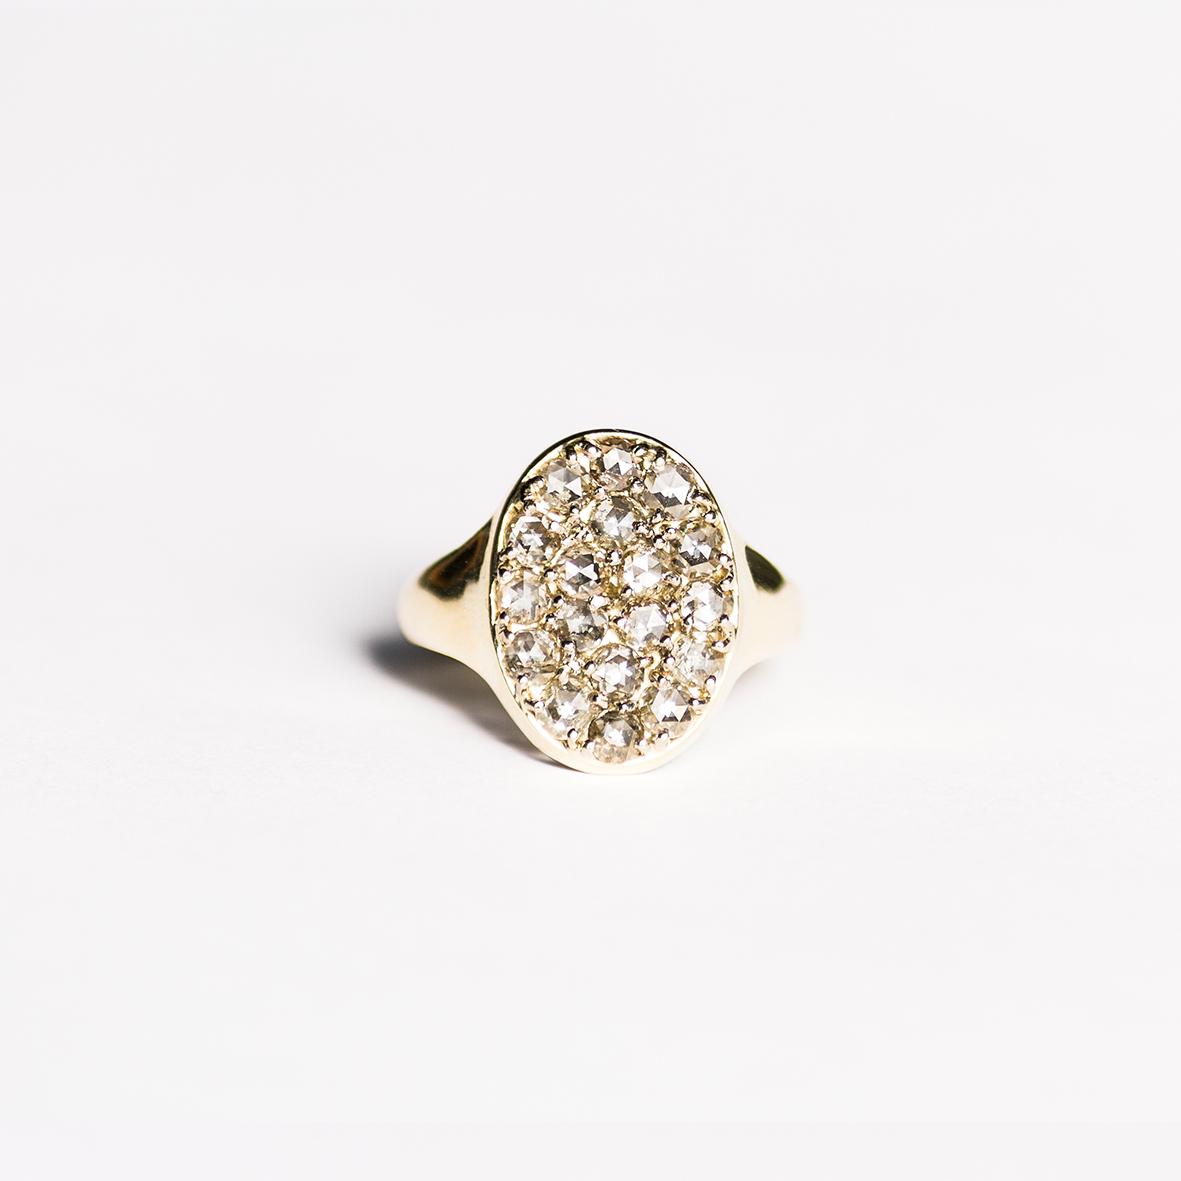 2. OONA_lotus_ficha1_signet diamond ring